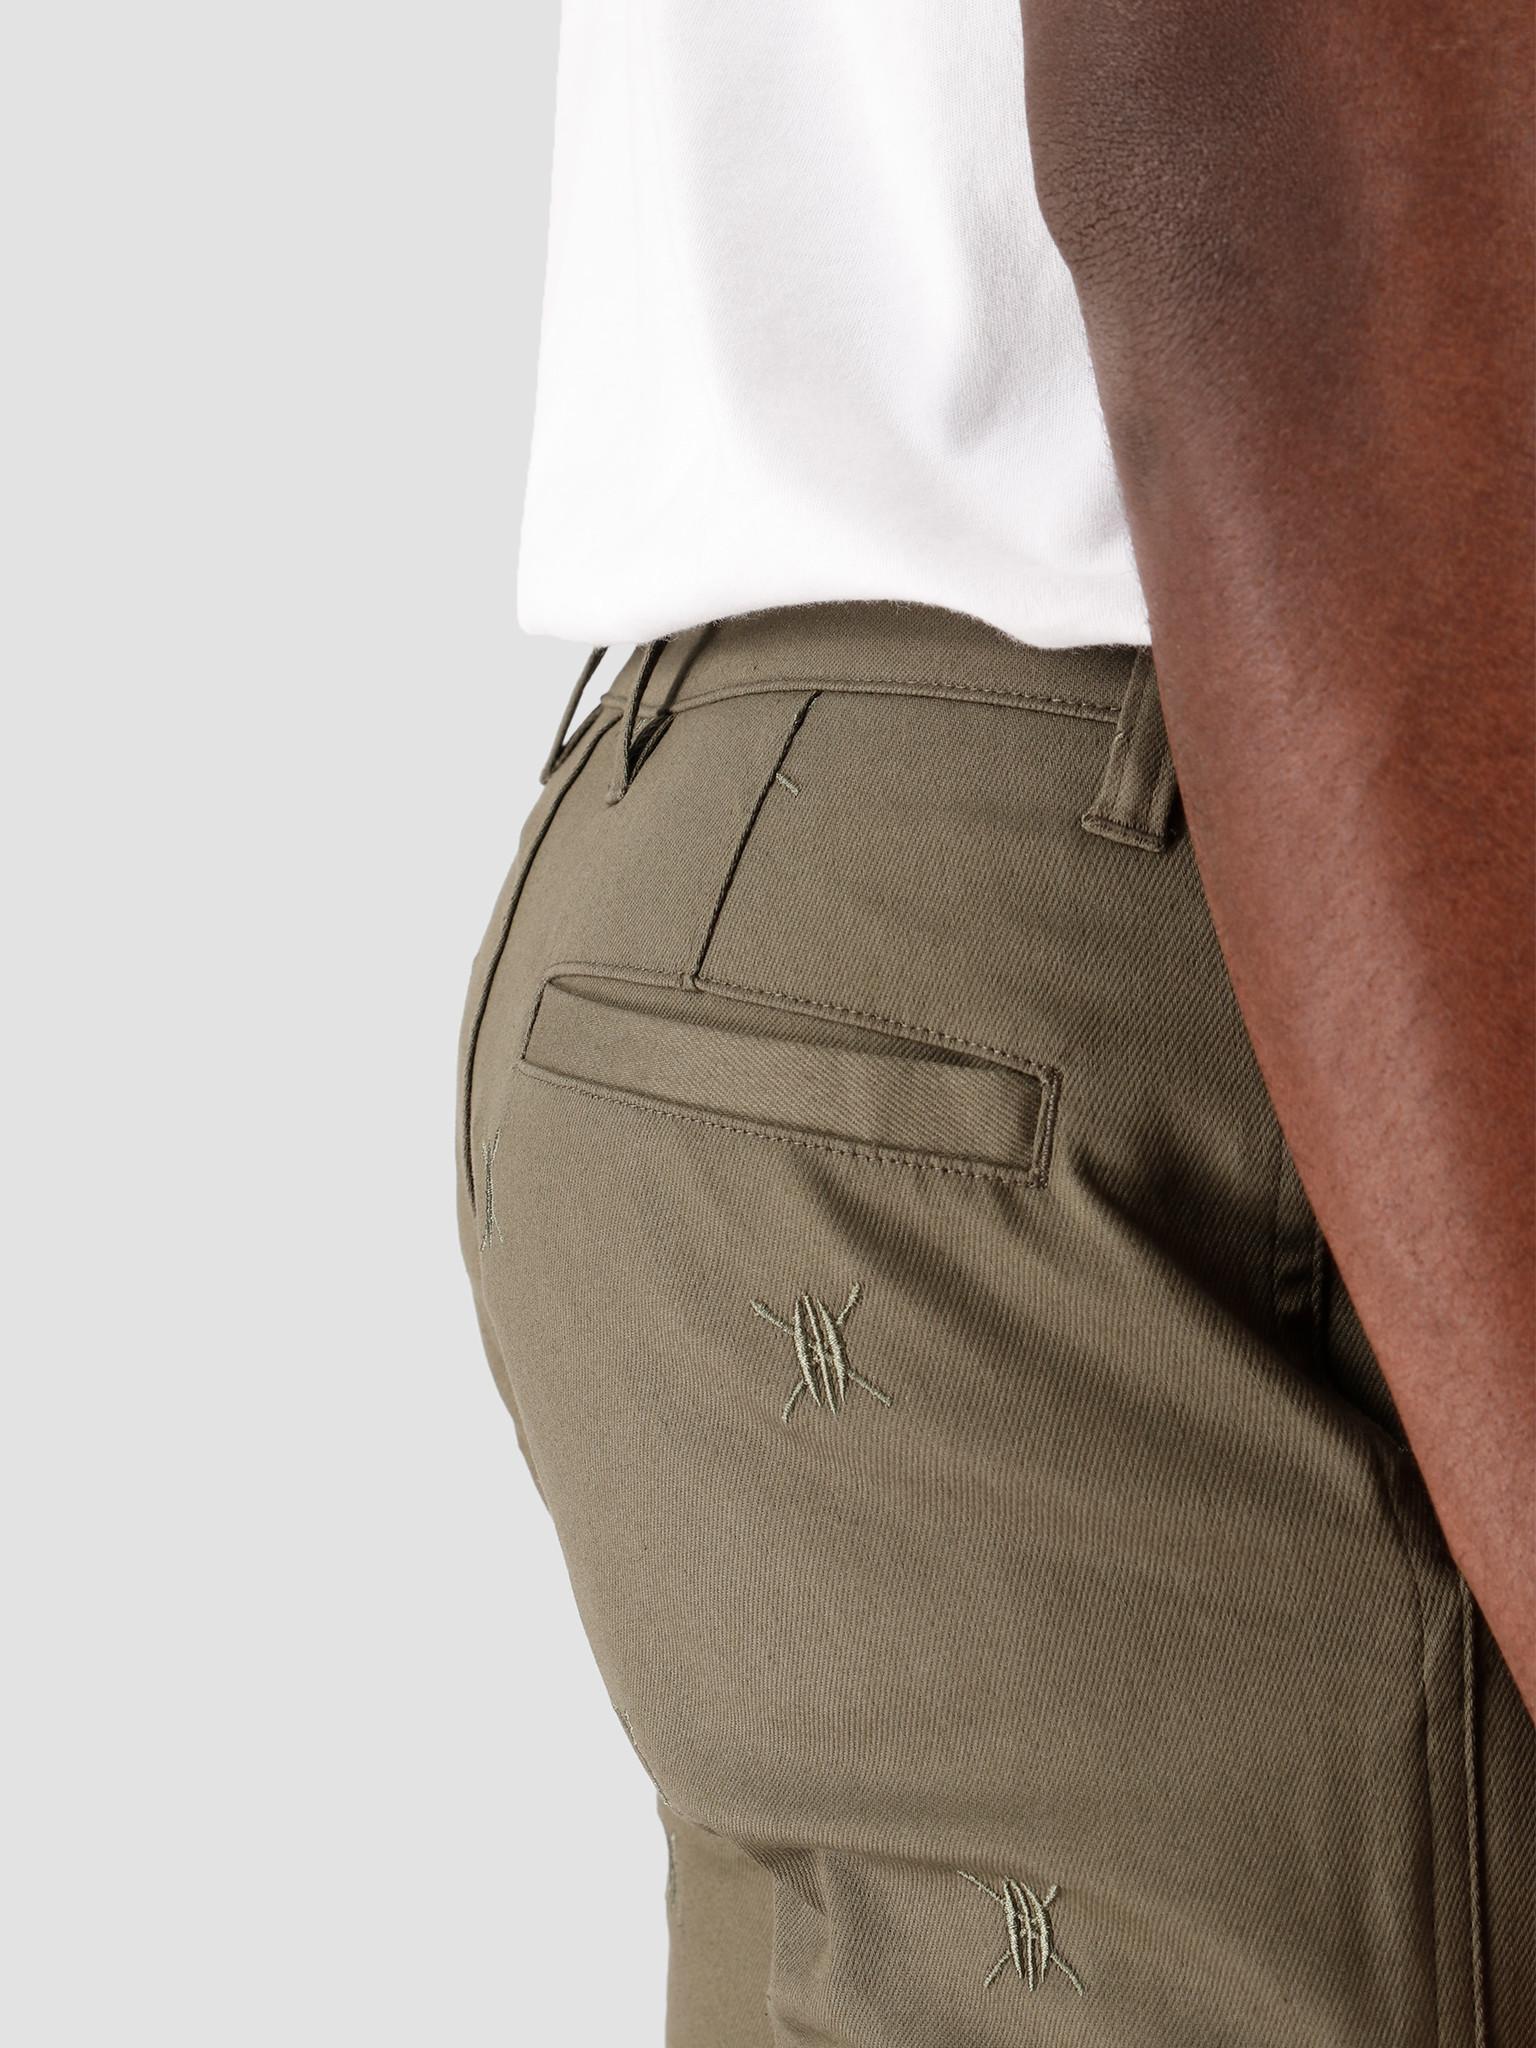 Daily Paper Daily Paper Kenya Pants Kenya Pants Grape Leaf Green 20E1PA01-02